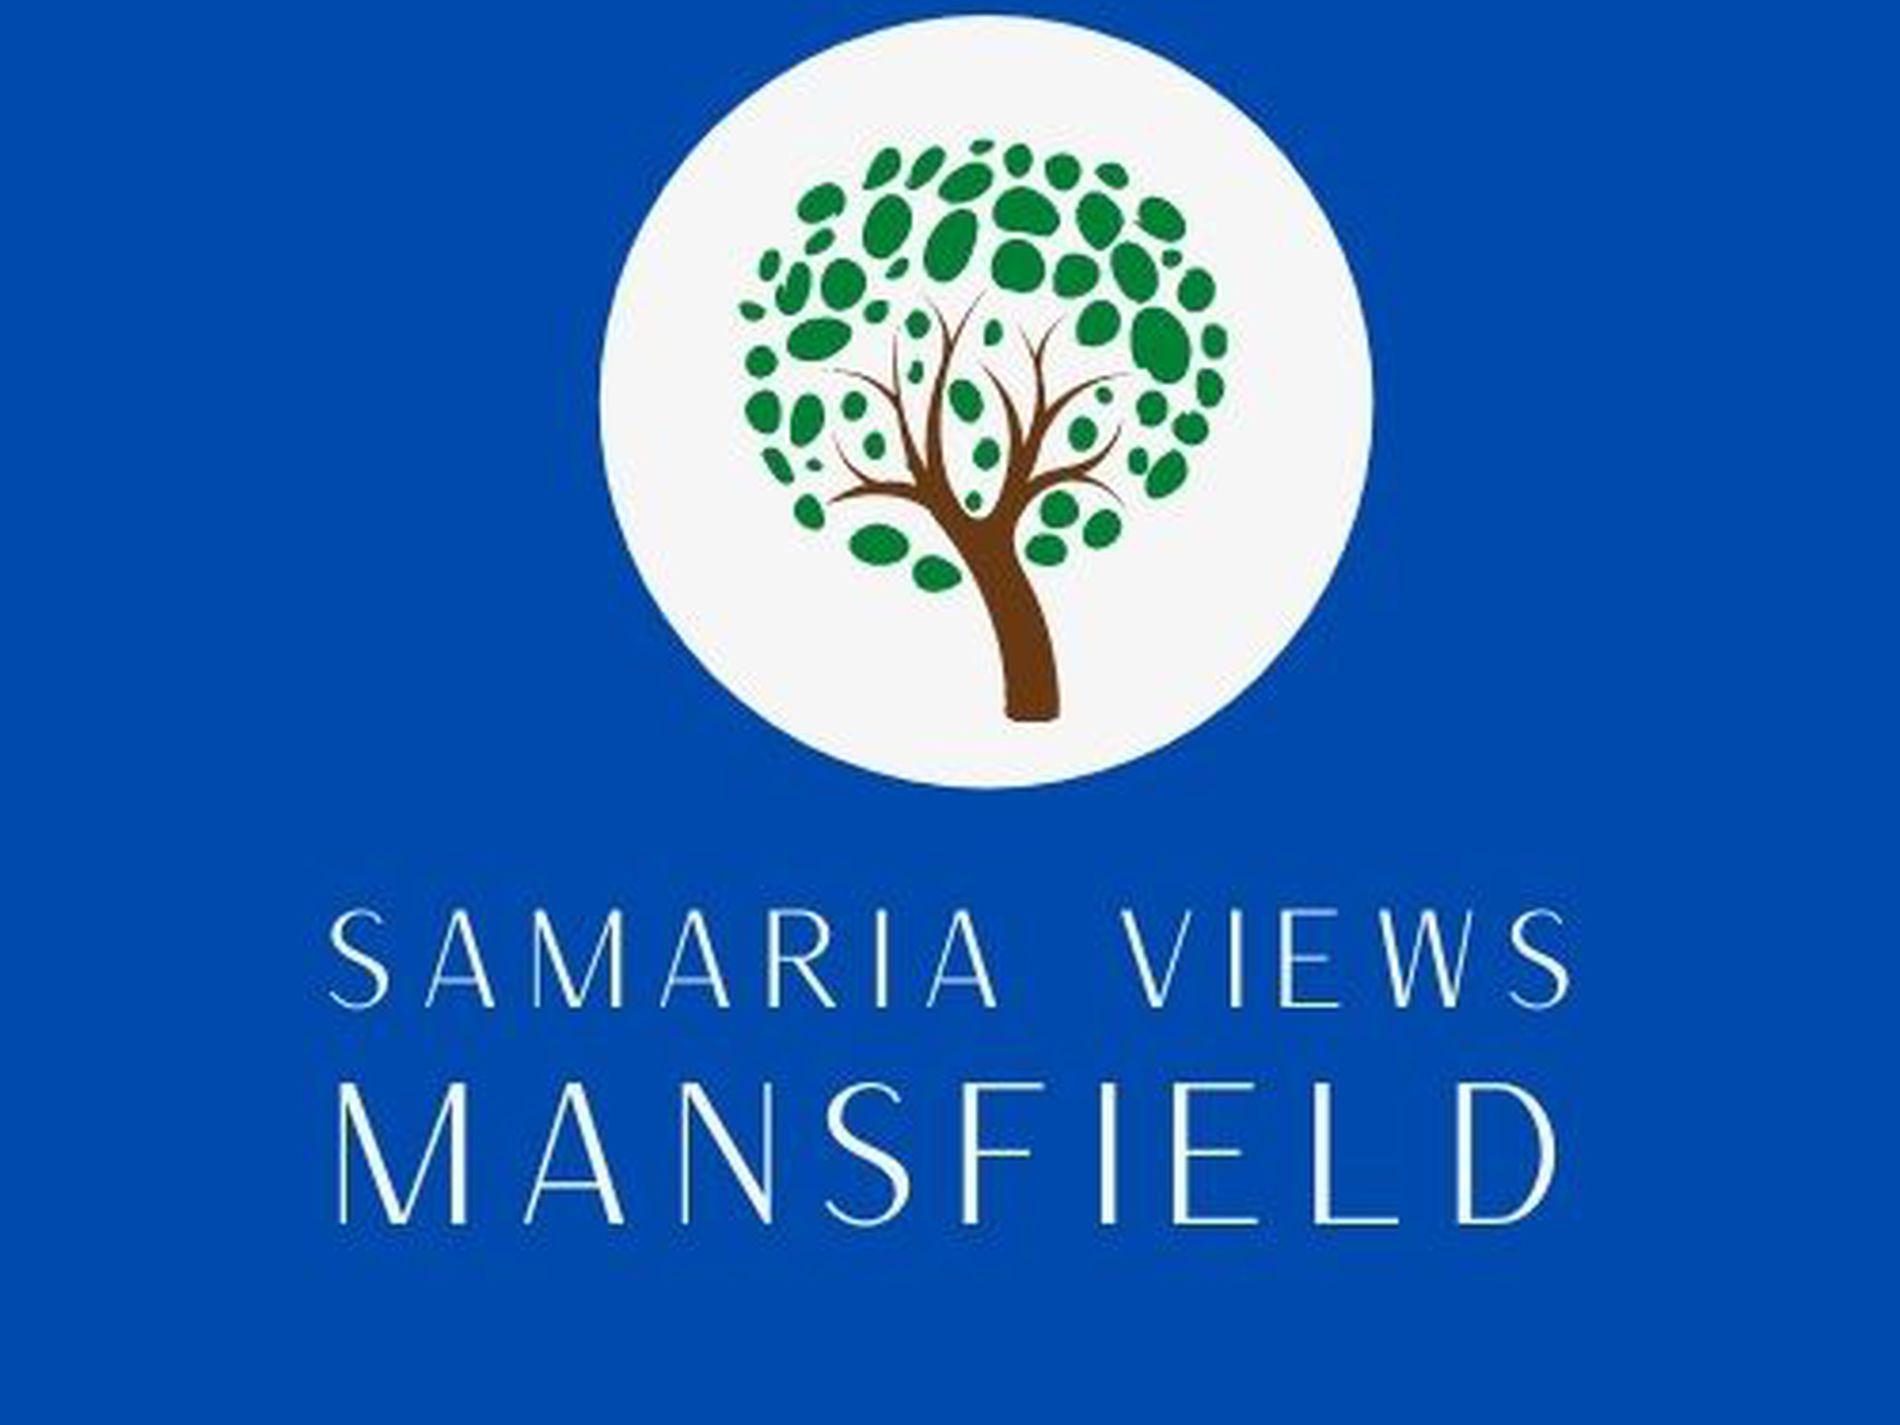 Lot 109, Samaria Views, Mansfield